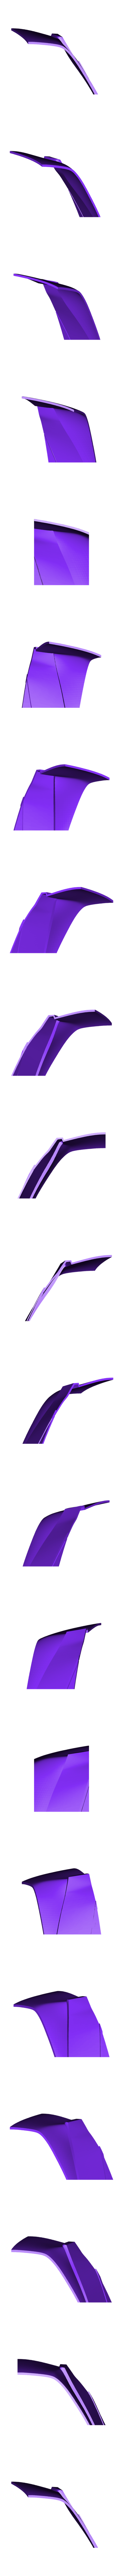 Part_17_v2.stl Download free STL file Battlestar Galactica Colonial Viper Pilot Helmet • 3D printing object, VillainousPropShop